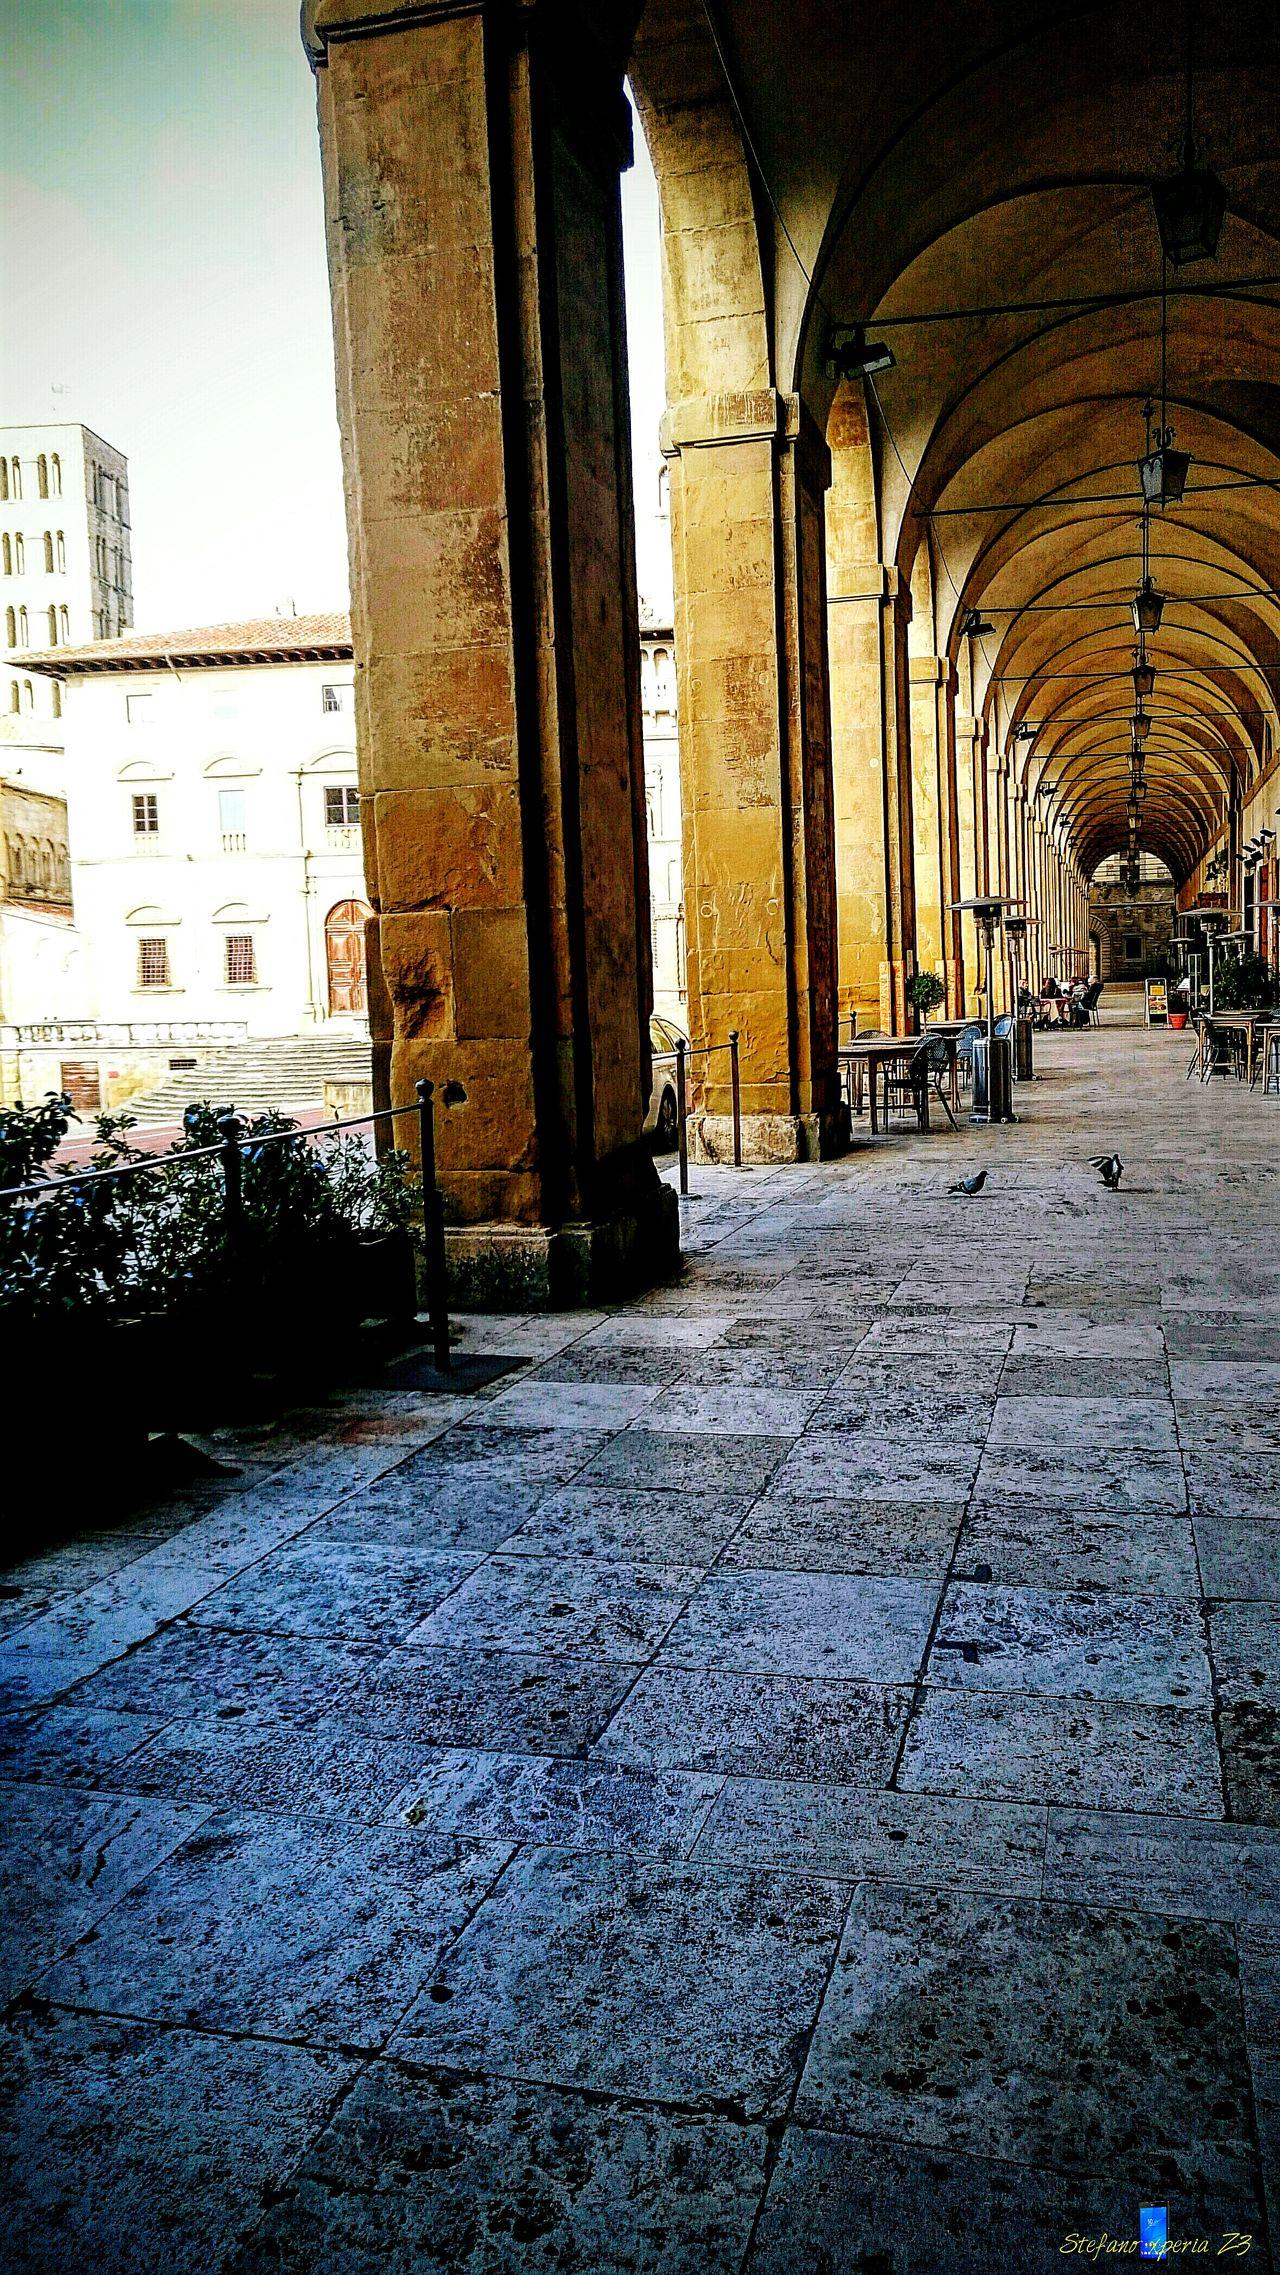 Z3 Xperia Old Town Nostalgic  Logge Vasari Piazza Grande Arezzo Italy🇮🇹 Arezzox